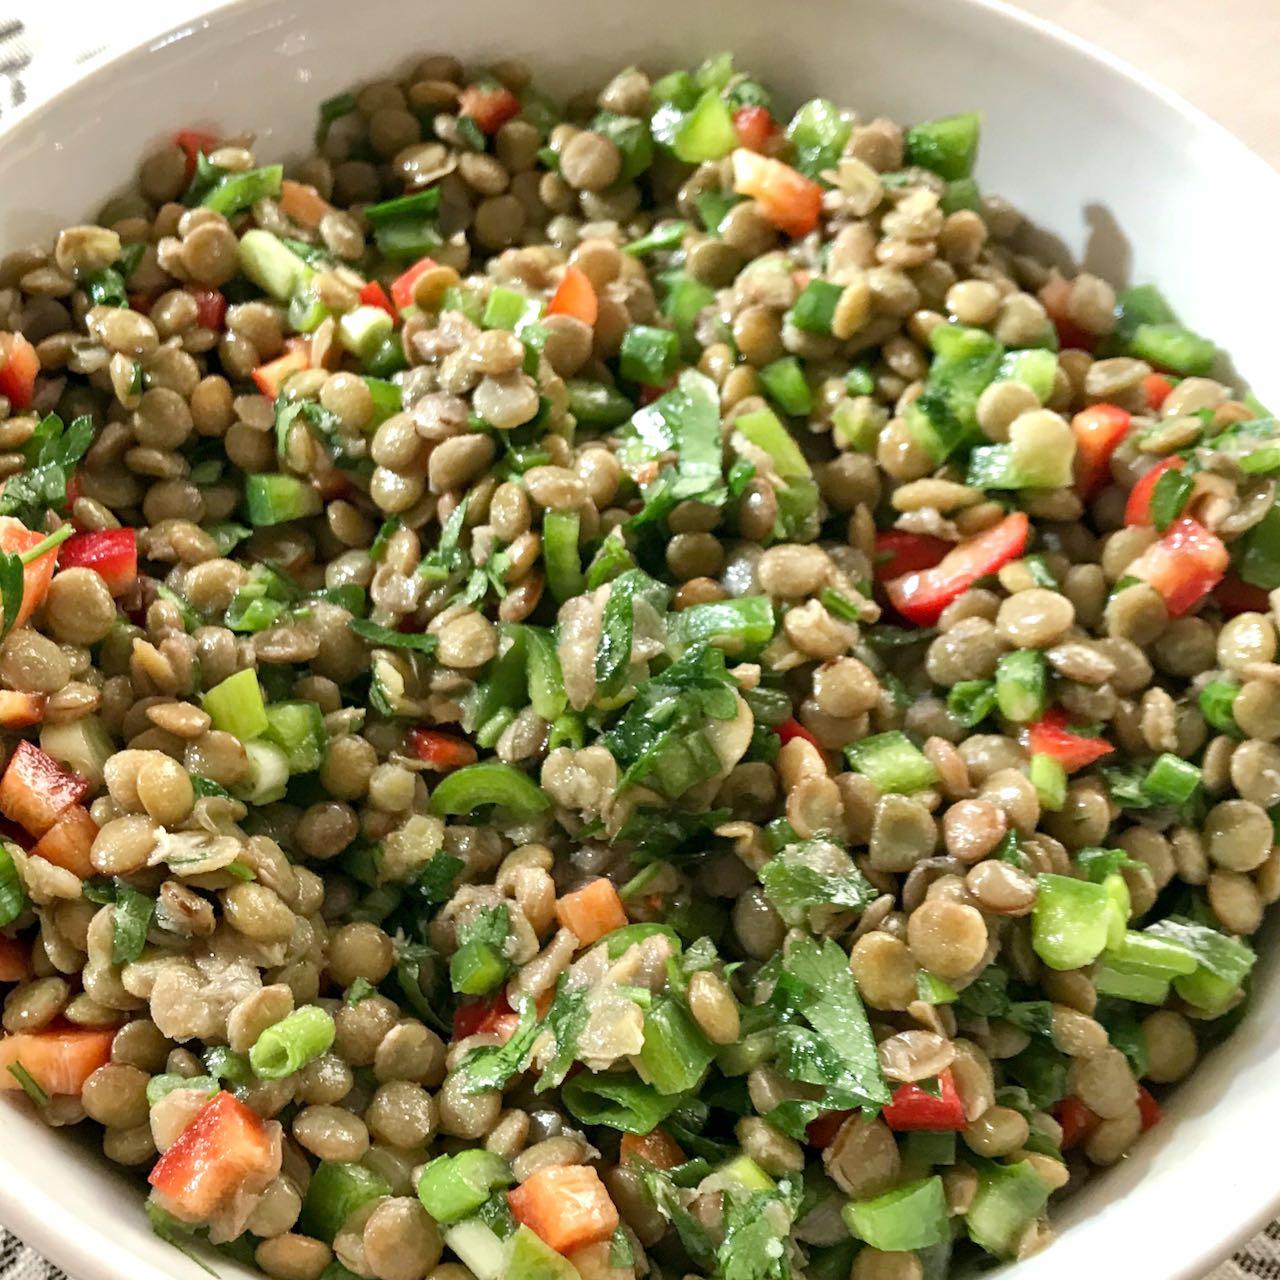 lenticchie verdi insalata – Gustorotondo – spesa online – buono sano artigiano